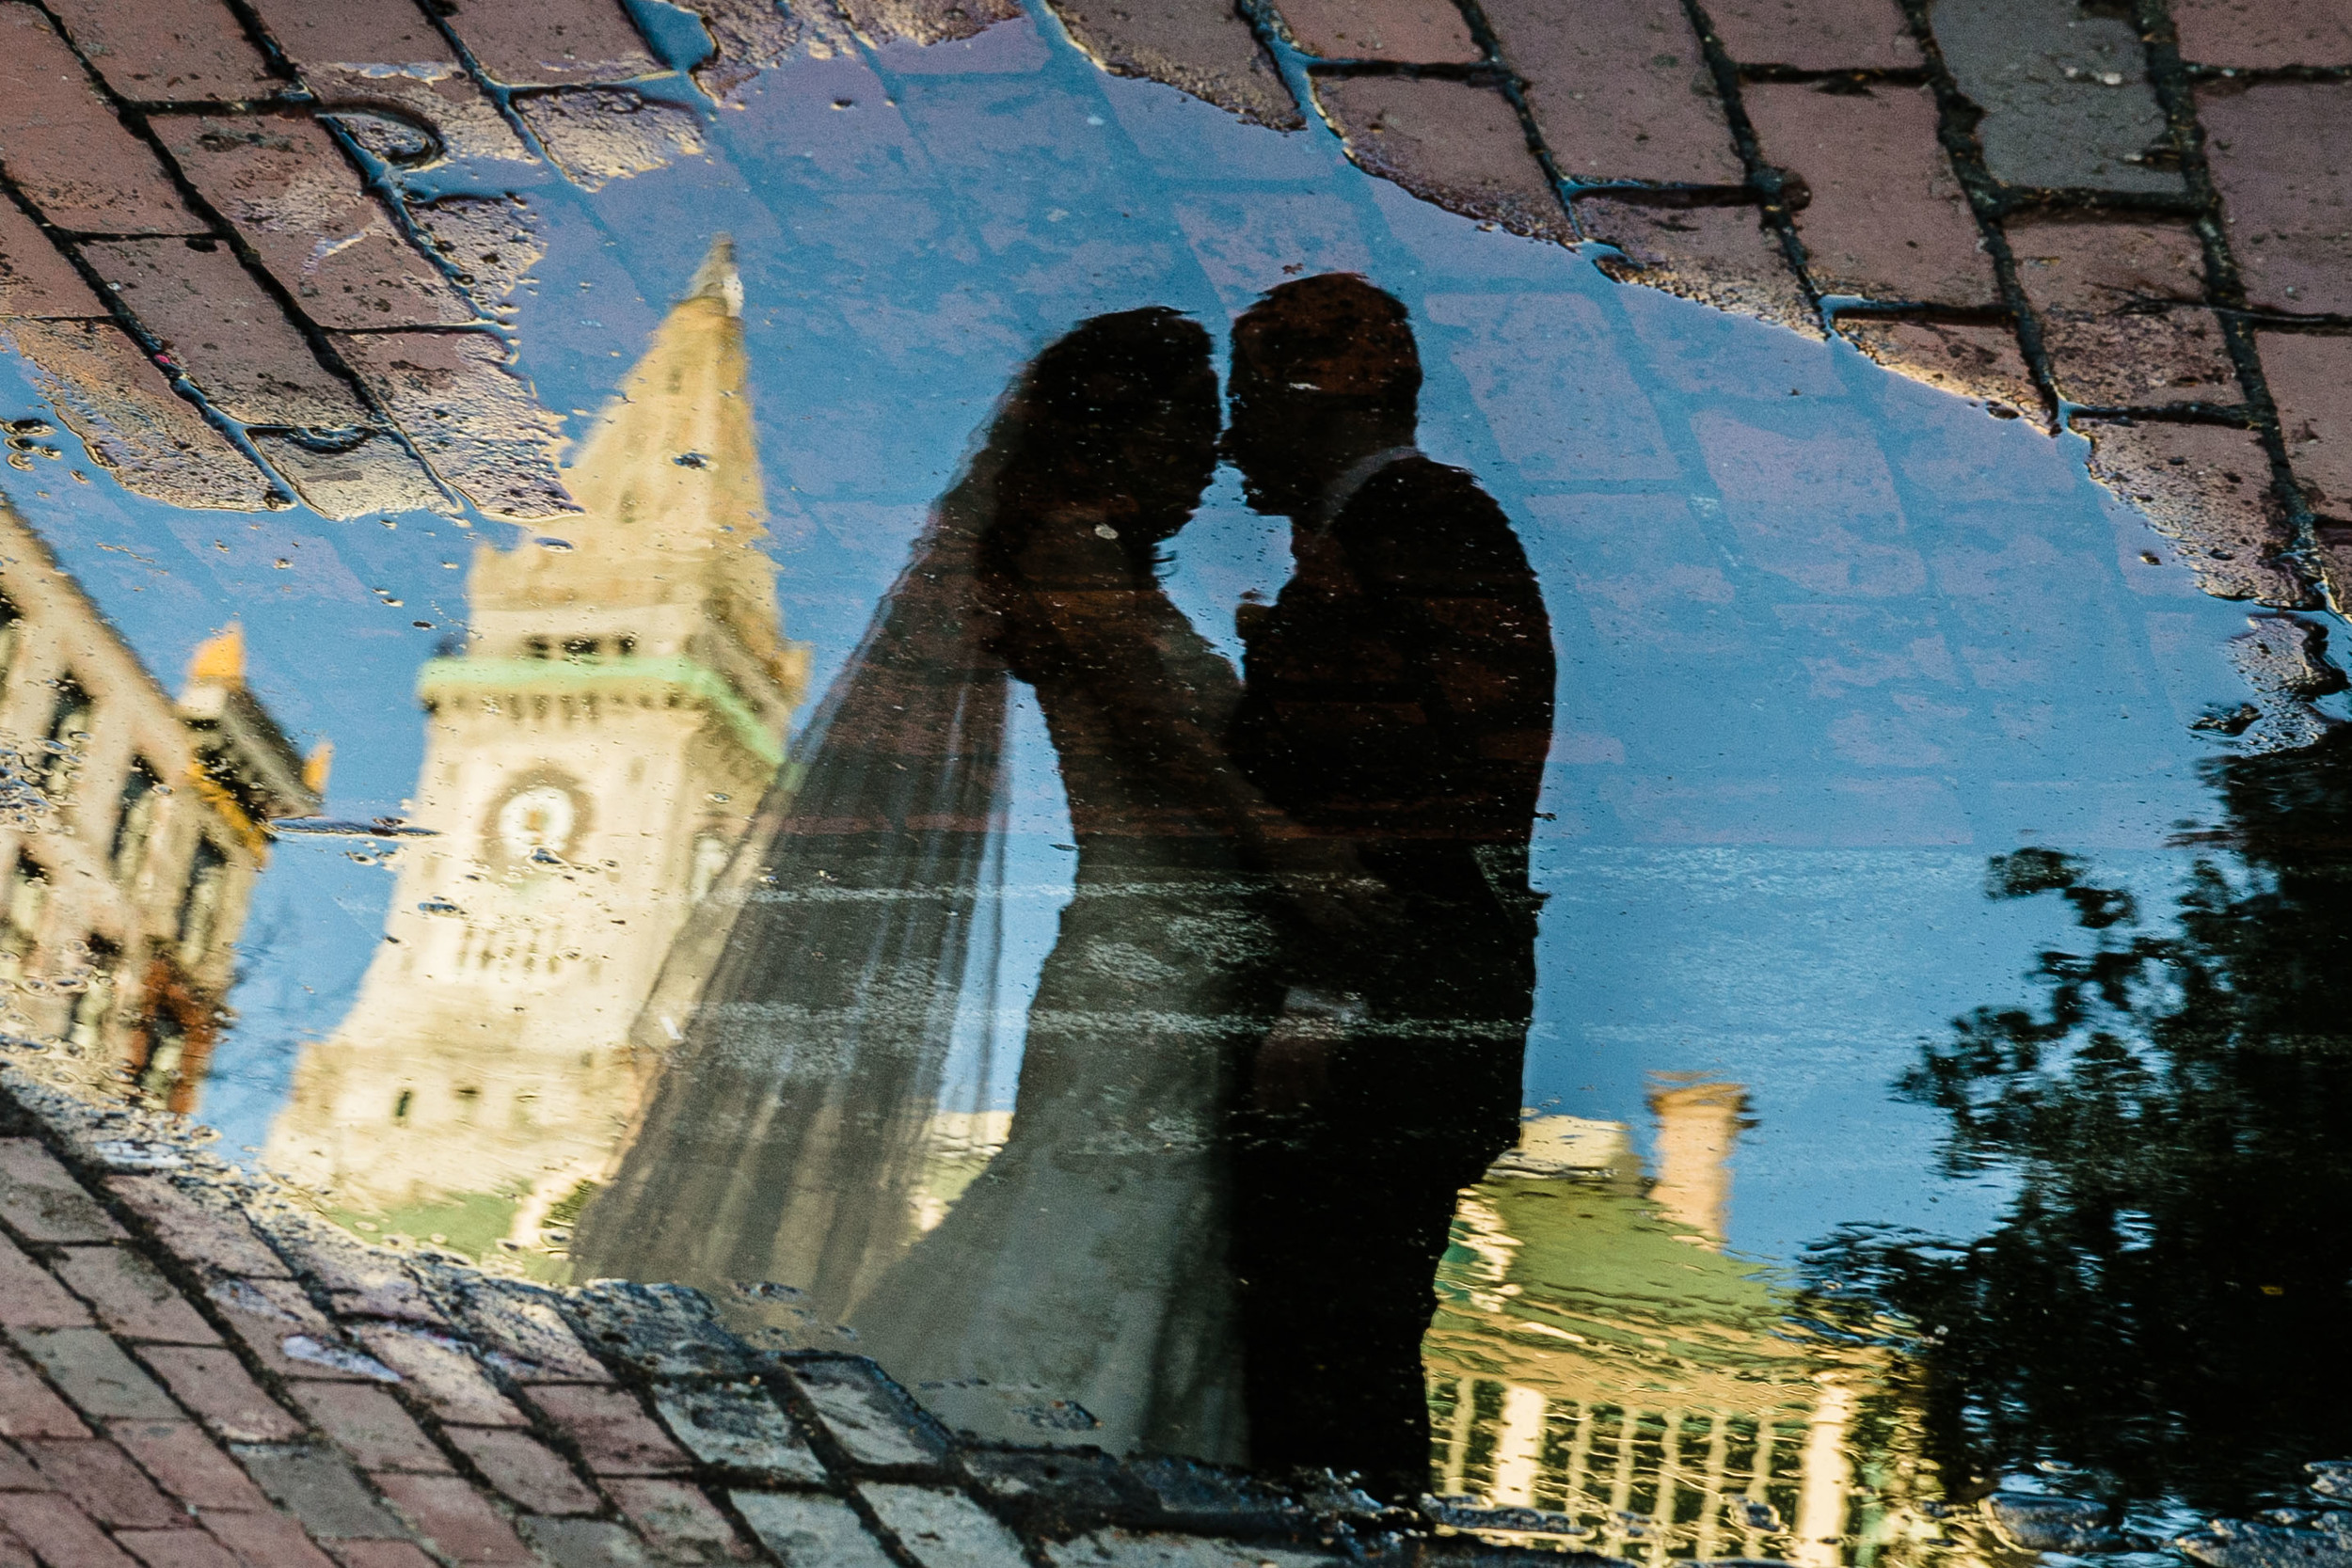 Asian-Wedding-State-Room-Boston-Massachusetts-Documentary-Photography-by-Jacek-Dolata-6.jpg